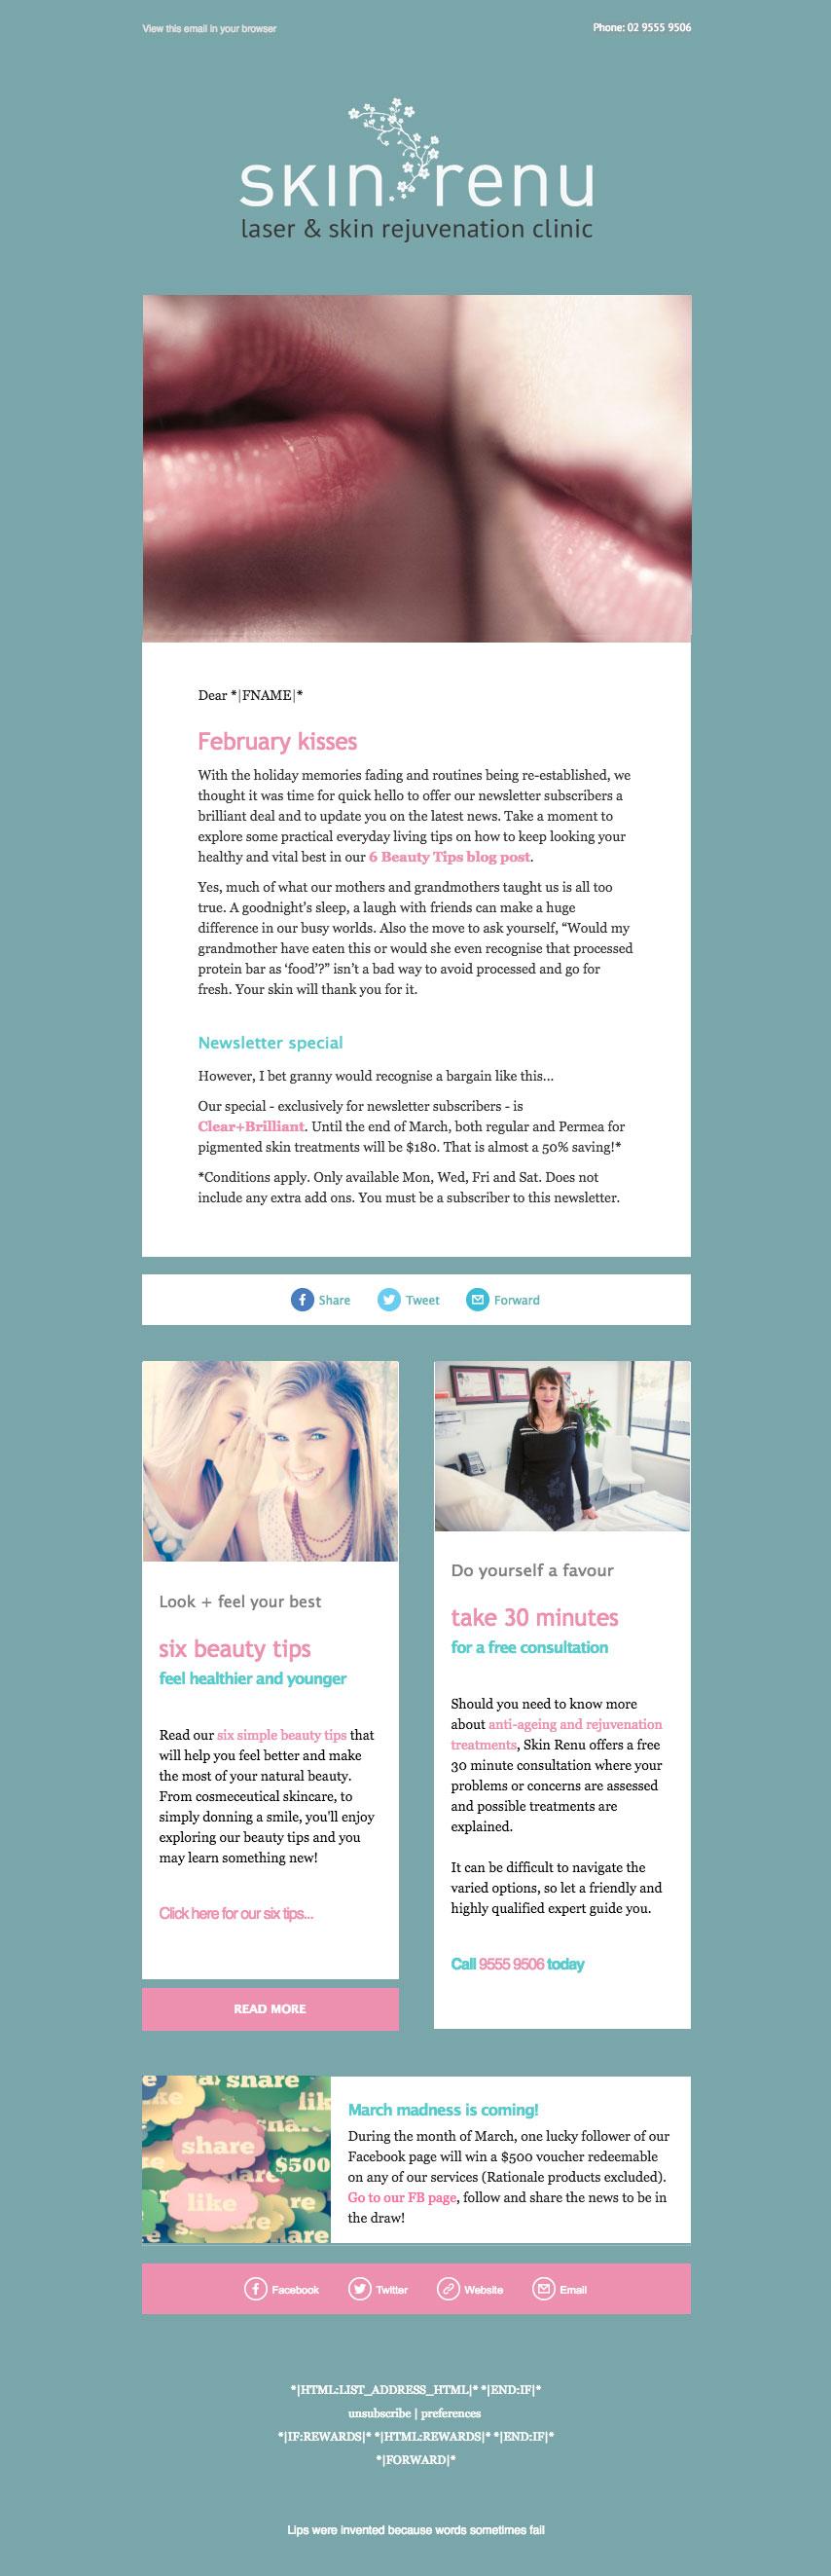 Skin Renu newsletter